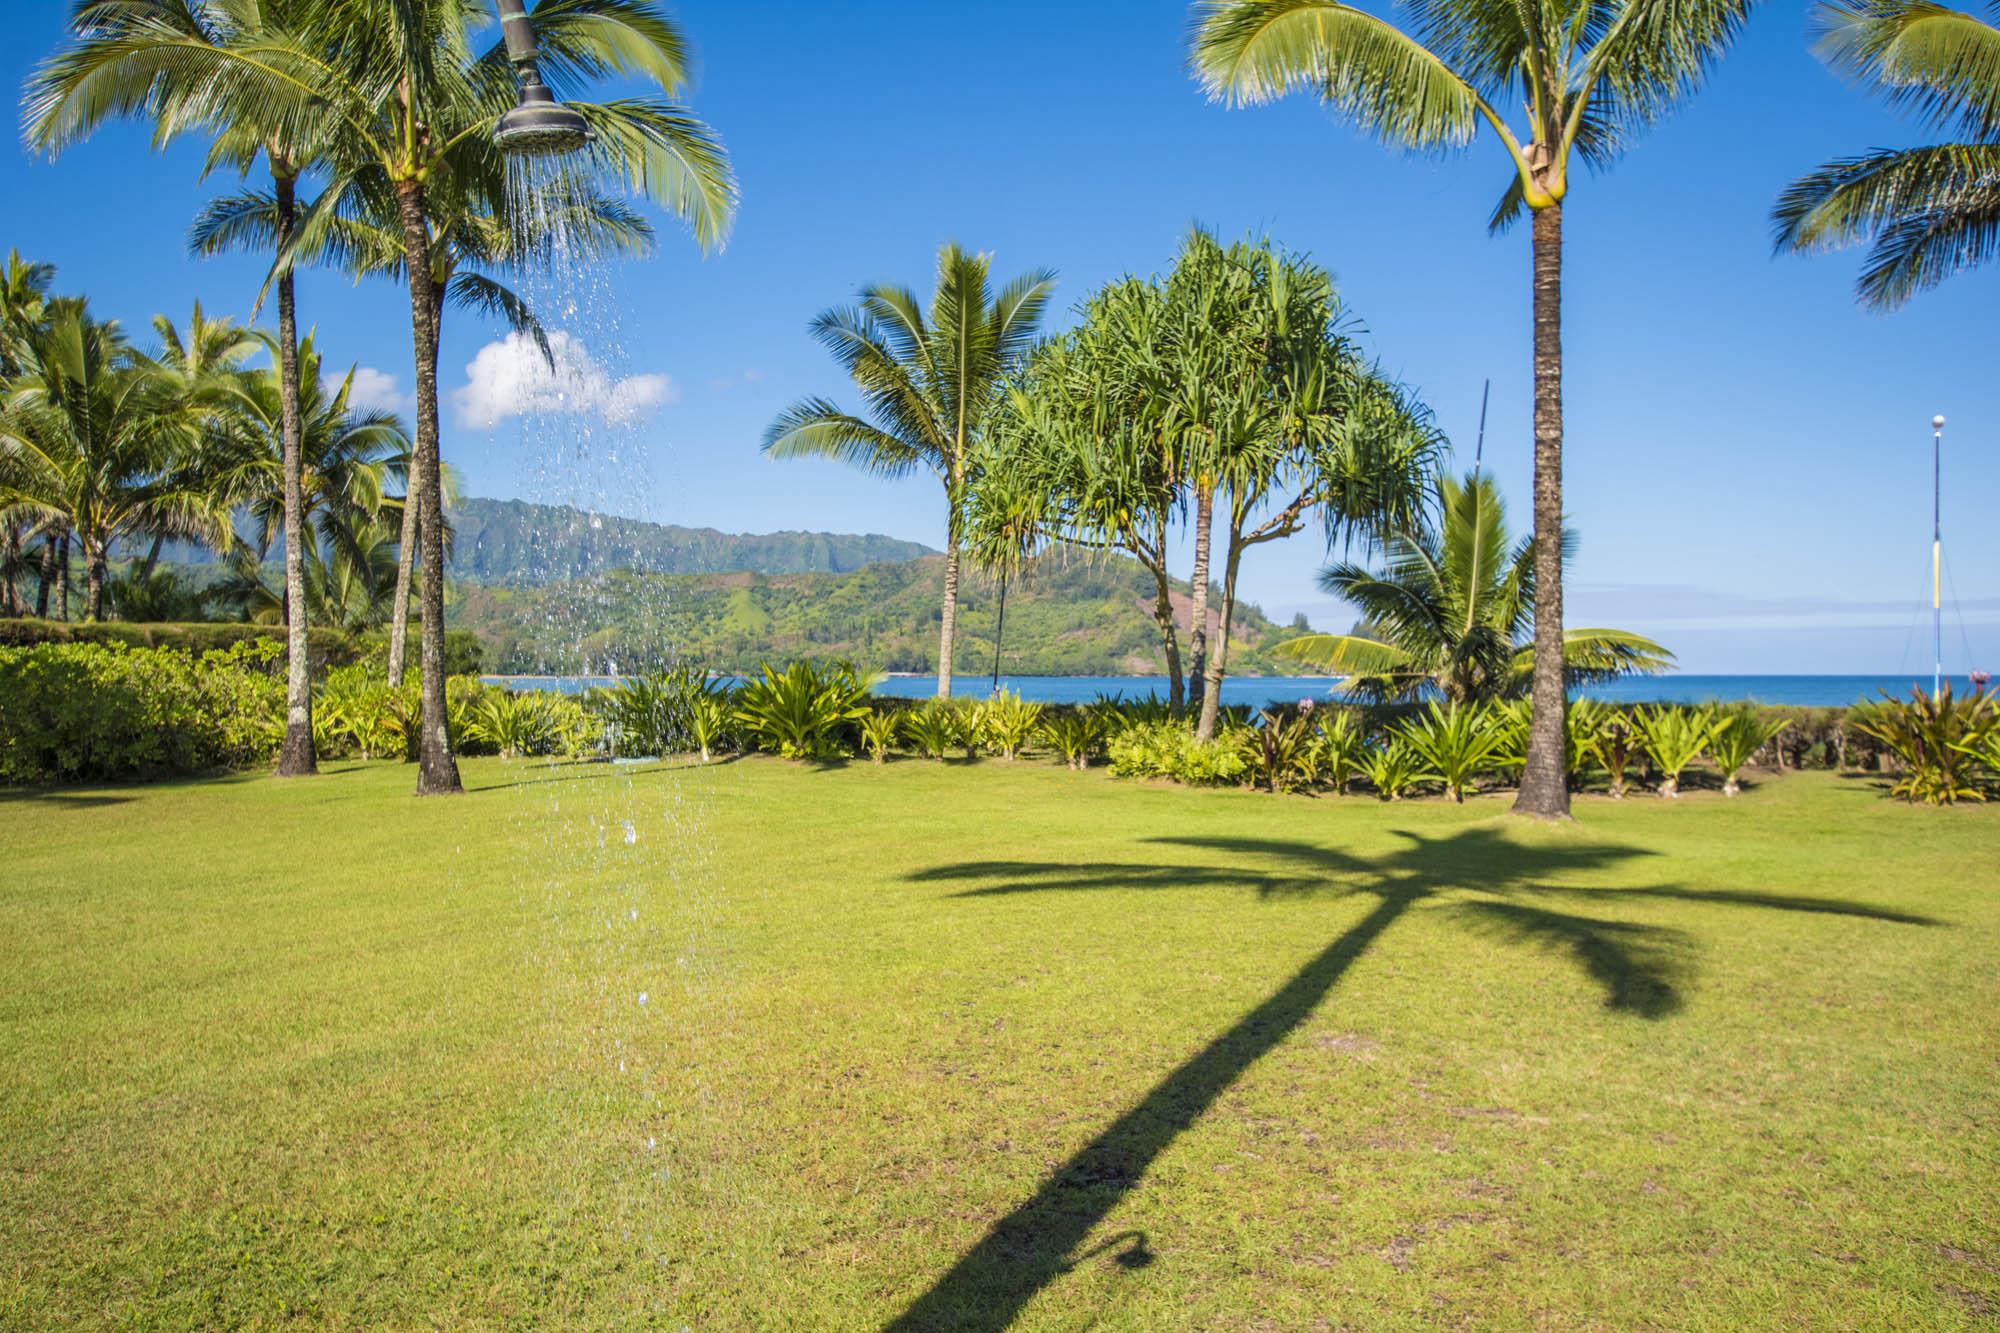 Kauai-217-Hanalei Bay42